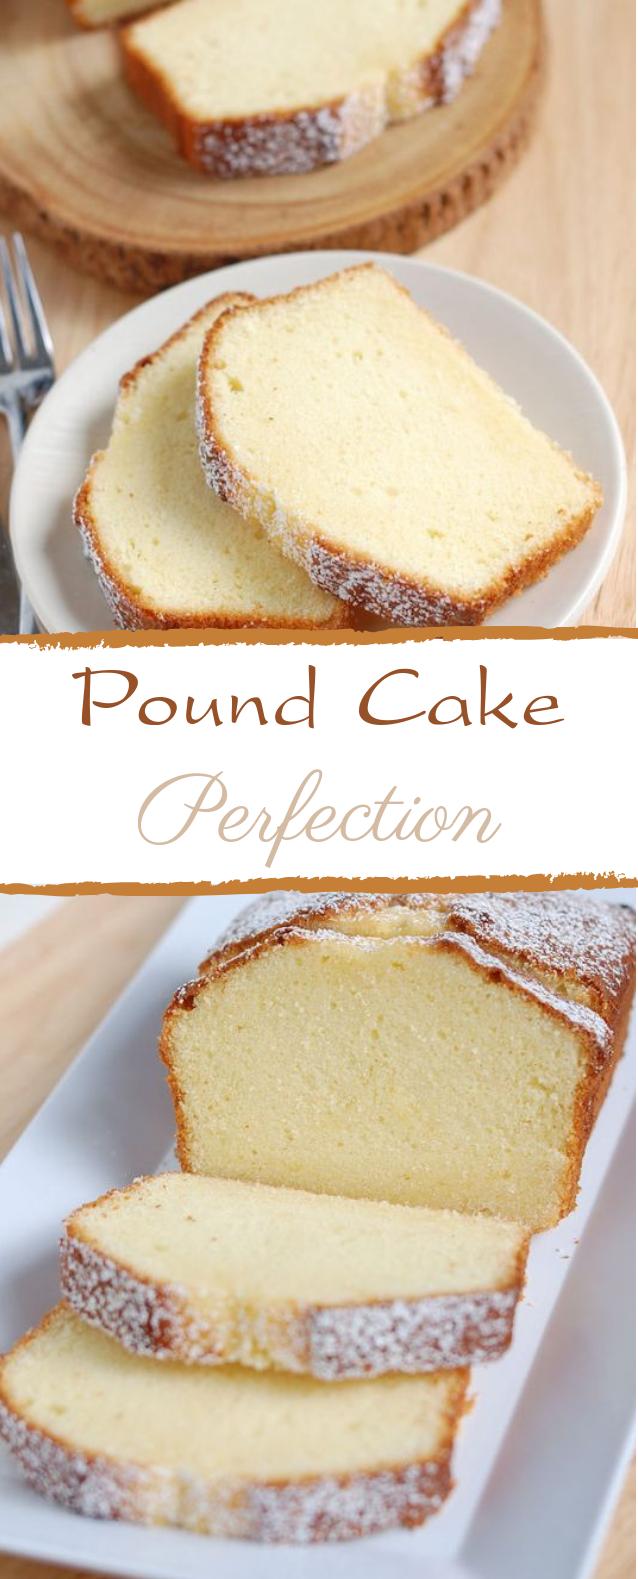 Pound Cake Perfection #bestrecipe #cake